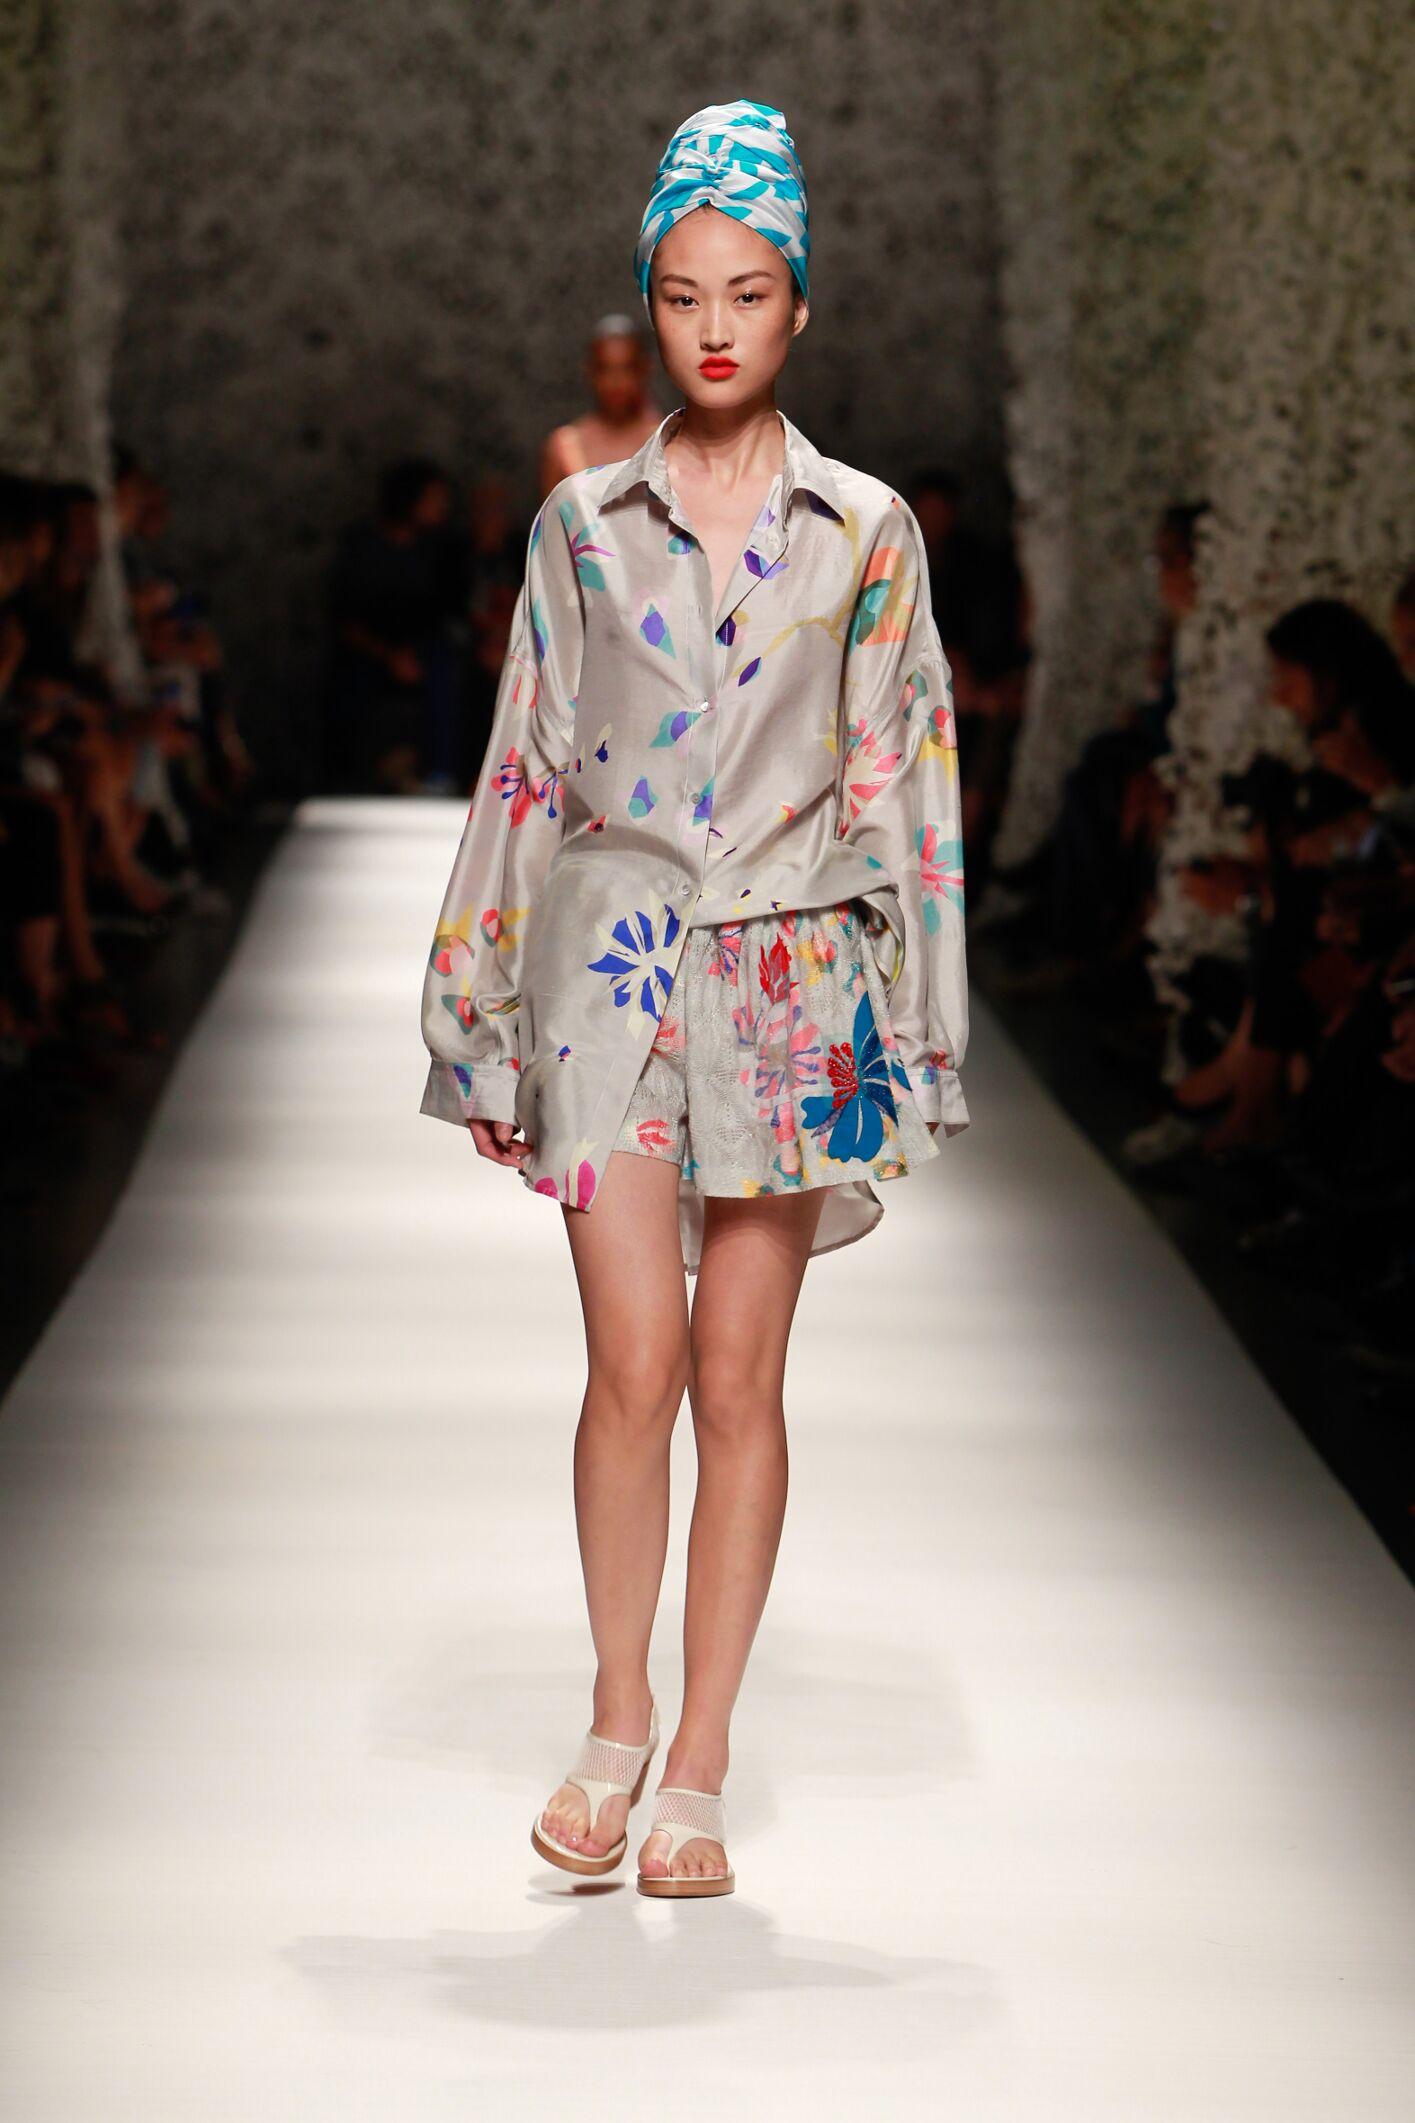 Catwalk Missoni Woman Fashion Show Summer 2015